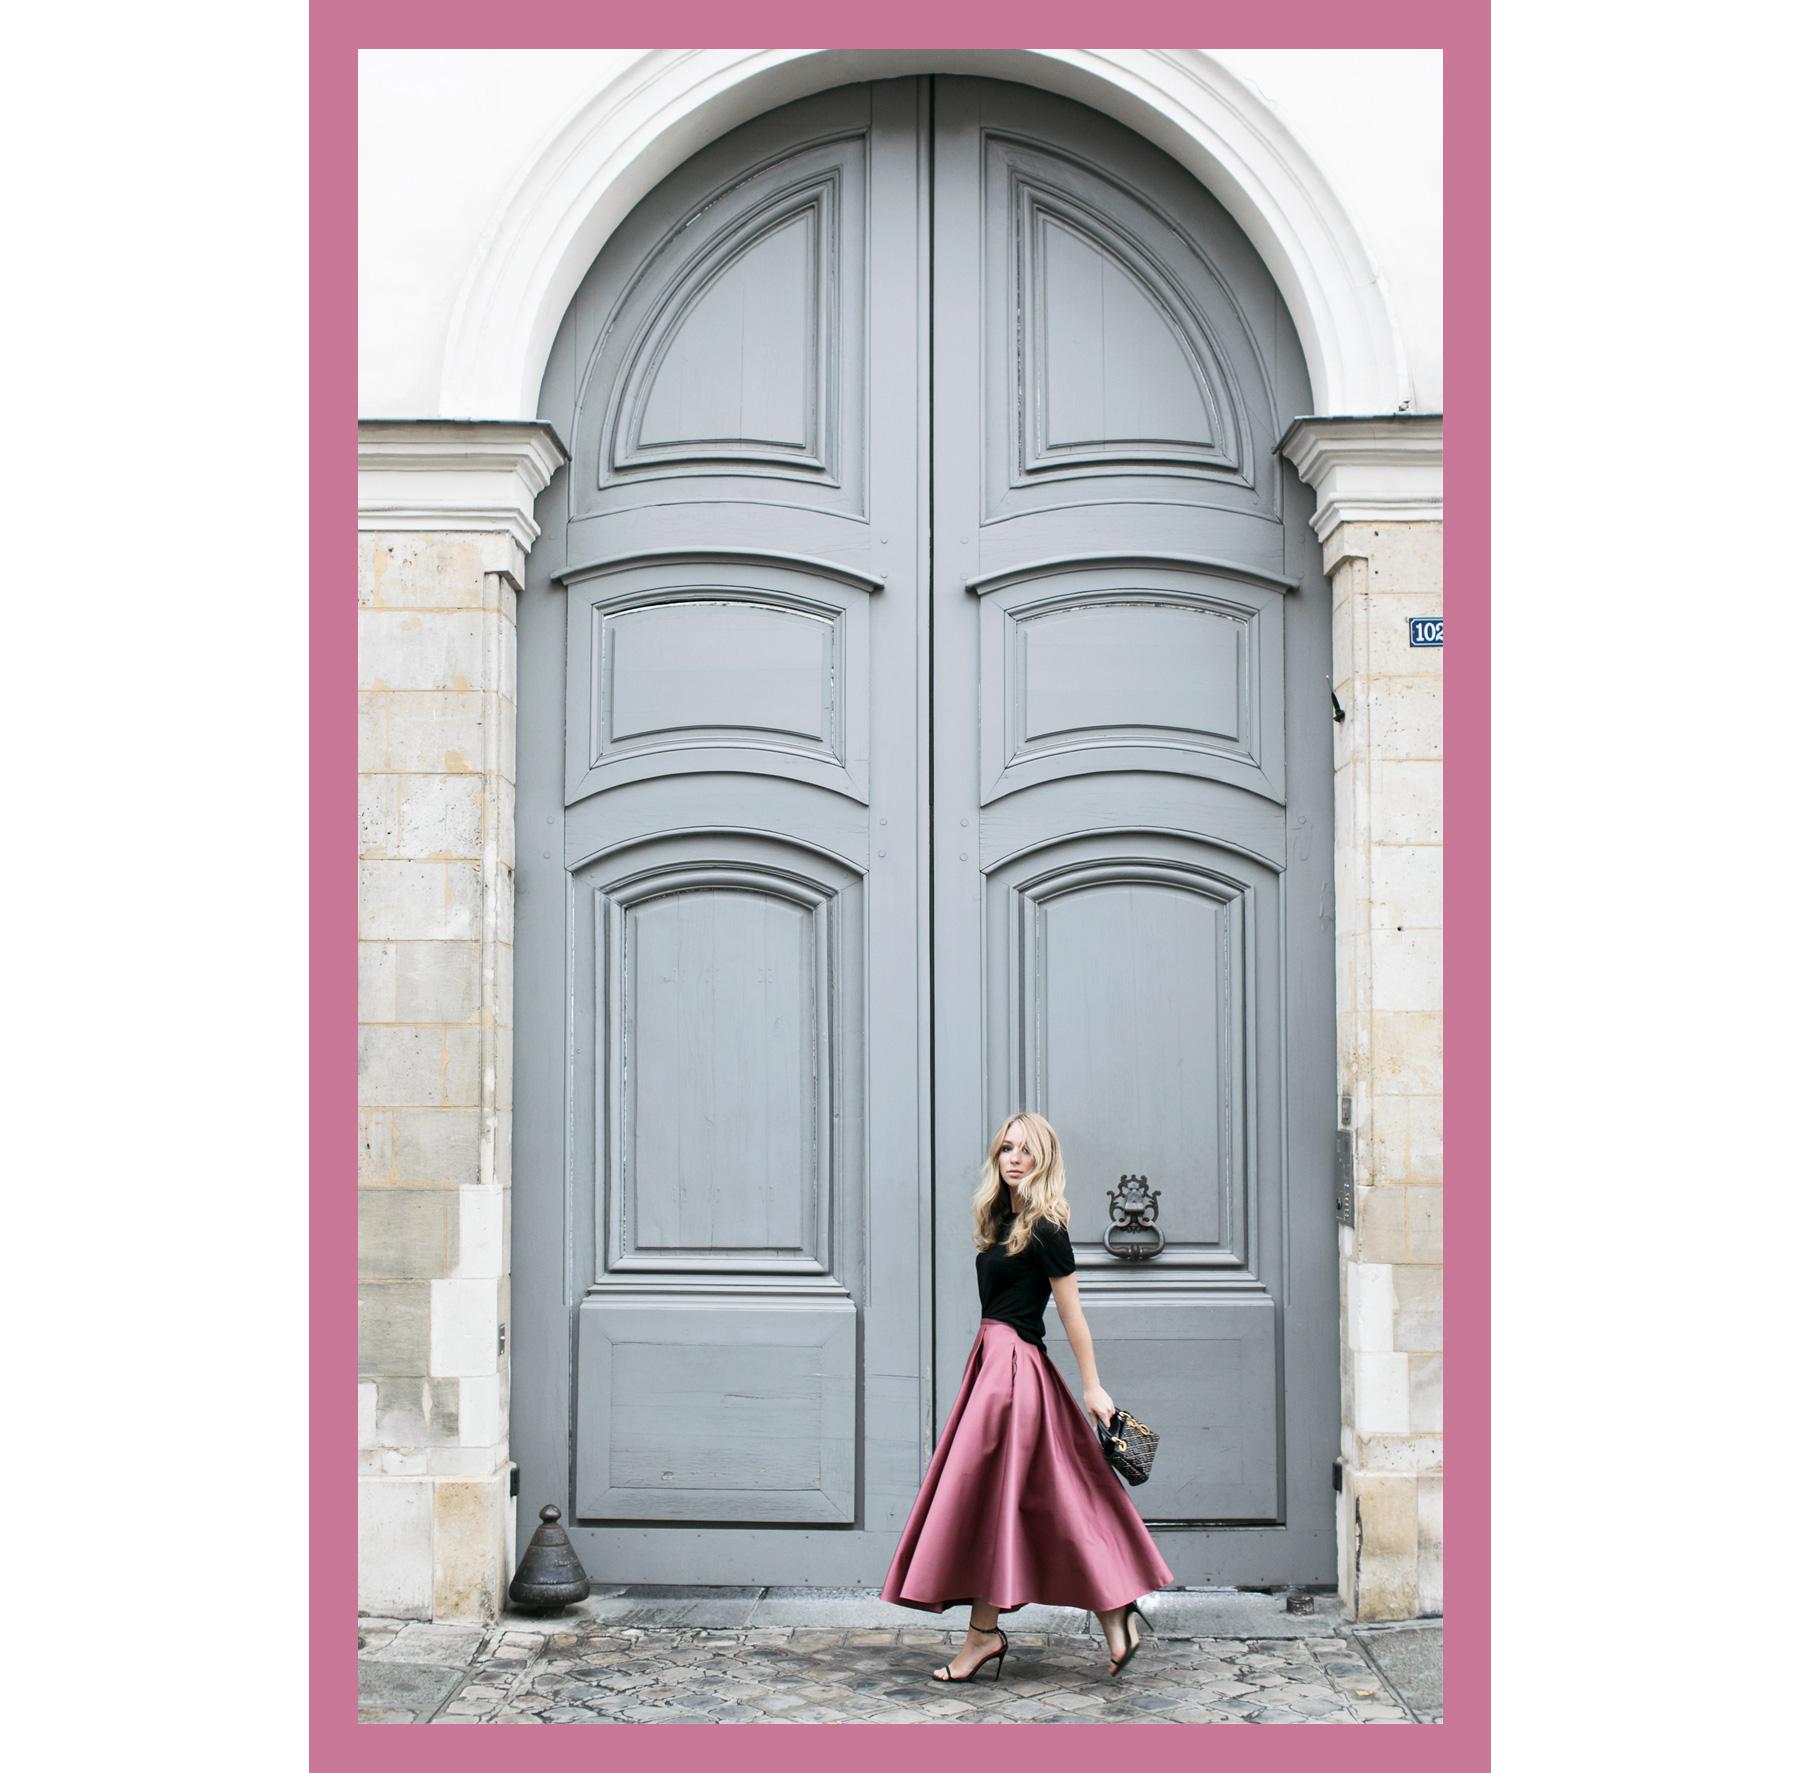 Rochas in Paris